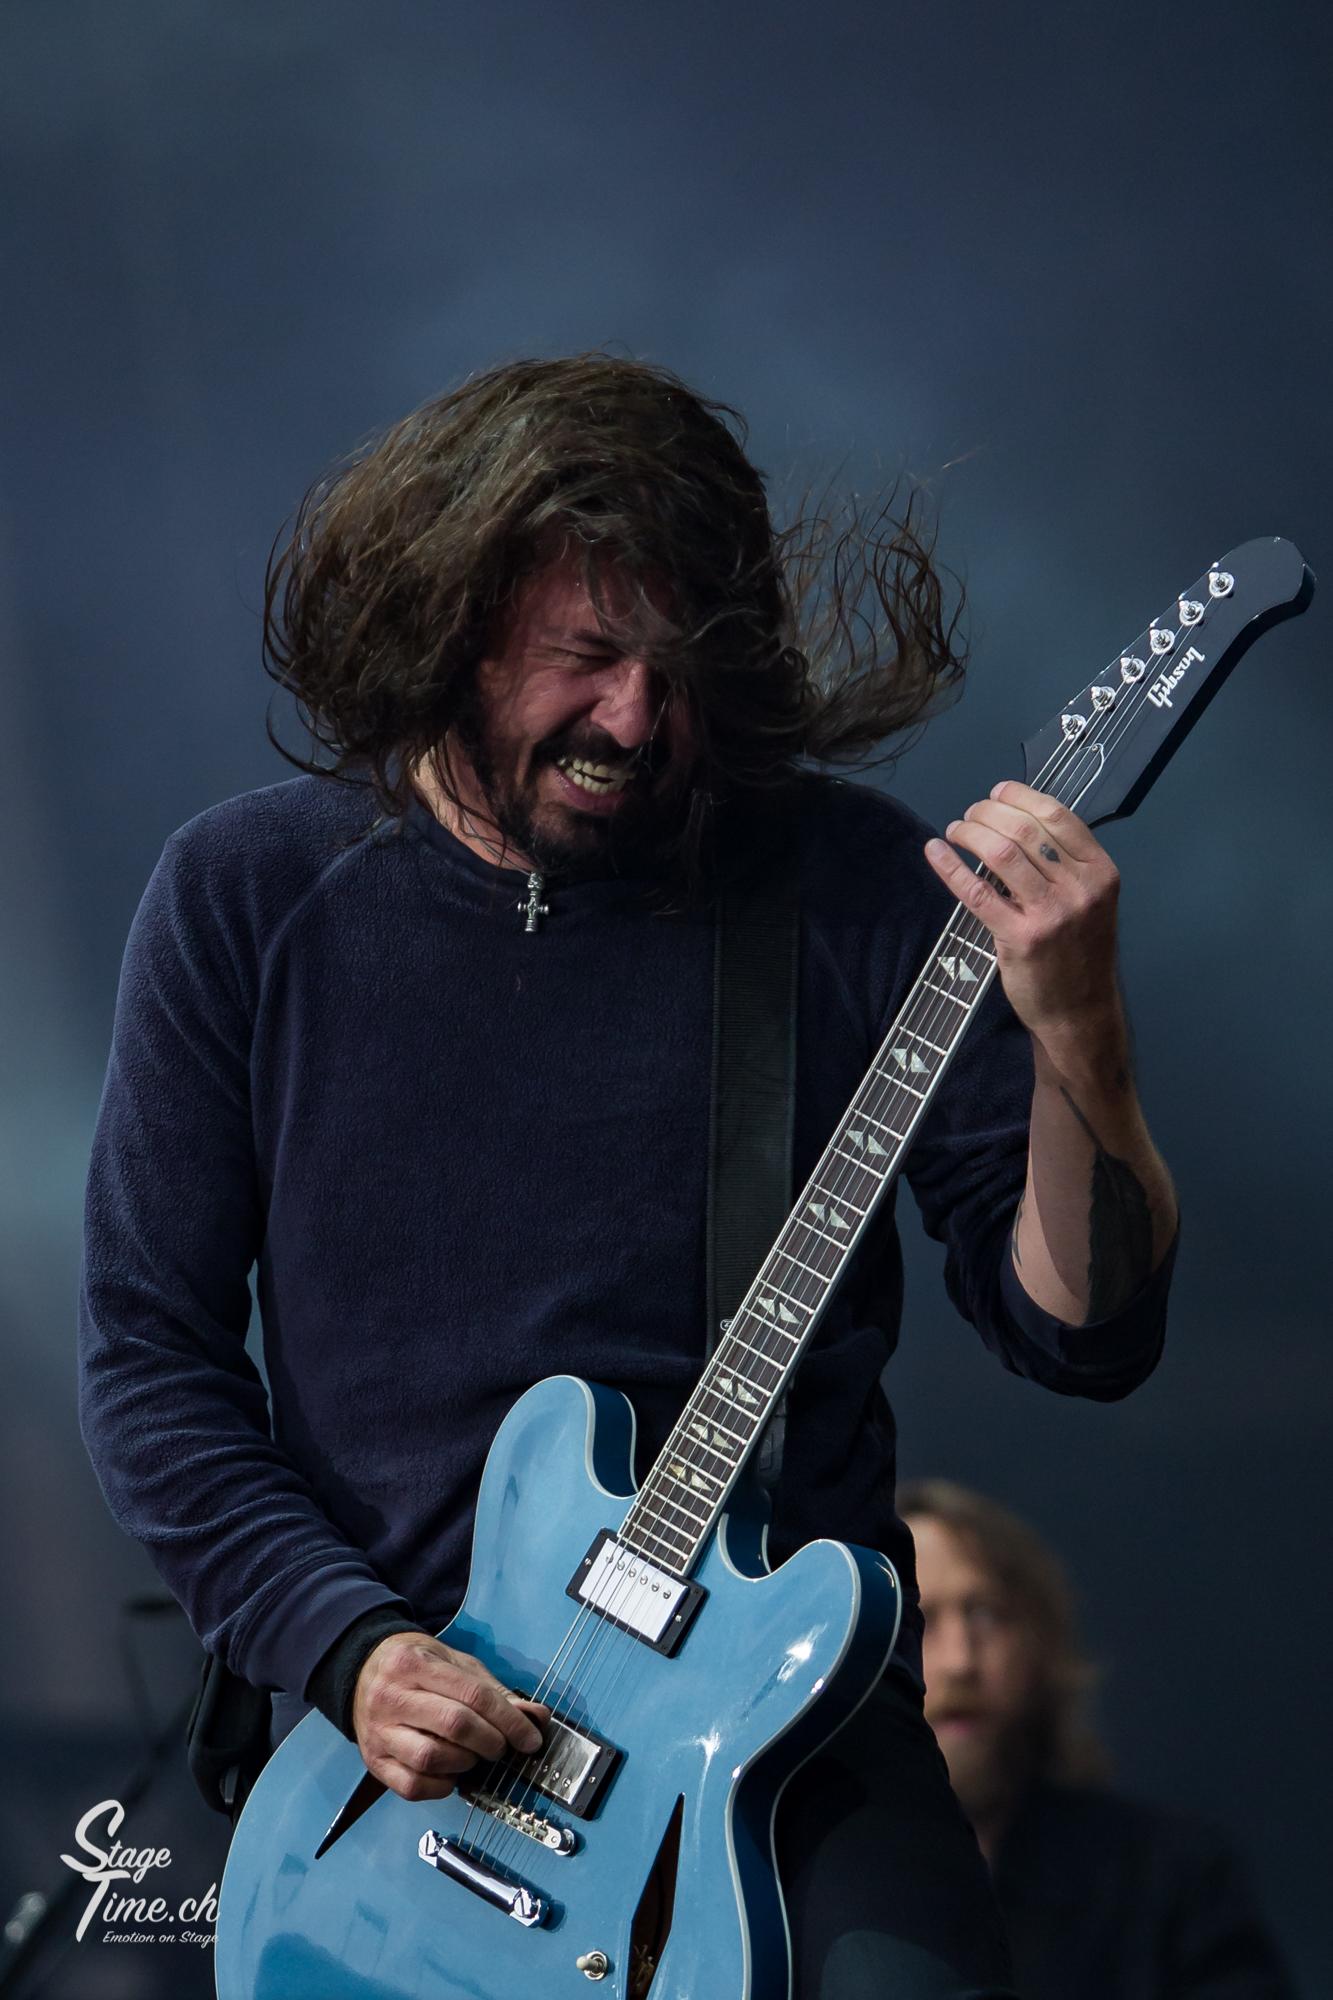 Foo_Fighters___📷_Christoph_Gurtner___stagetime.ch-7